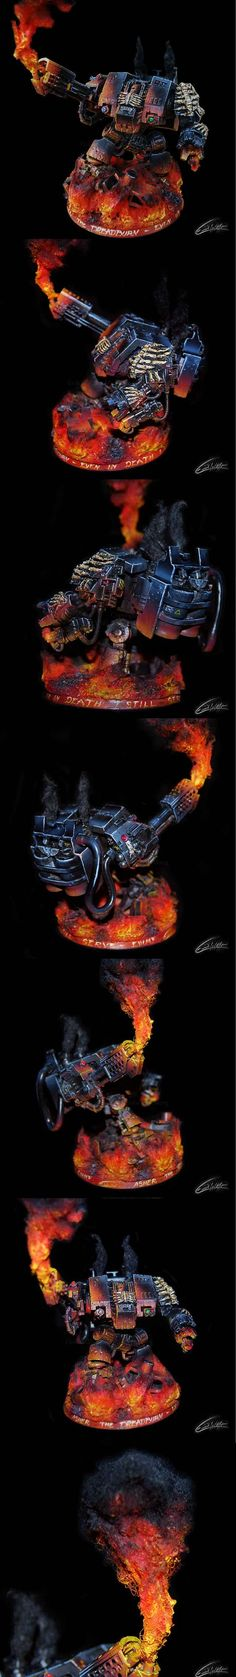 "Warhammer 40k E.W.M.F Painting & Building - Asher ""Dreadburn"" Dreadnought conversion. - Imgur"